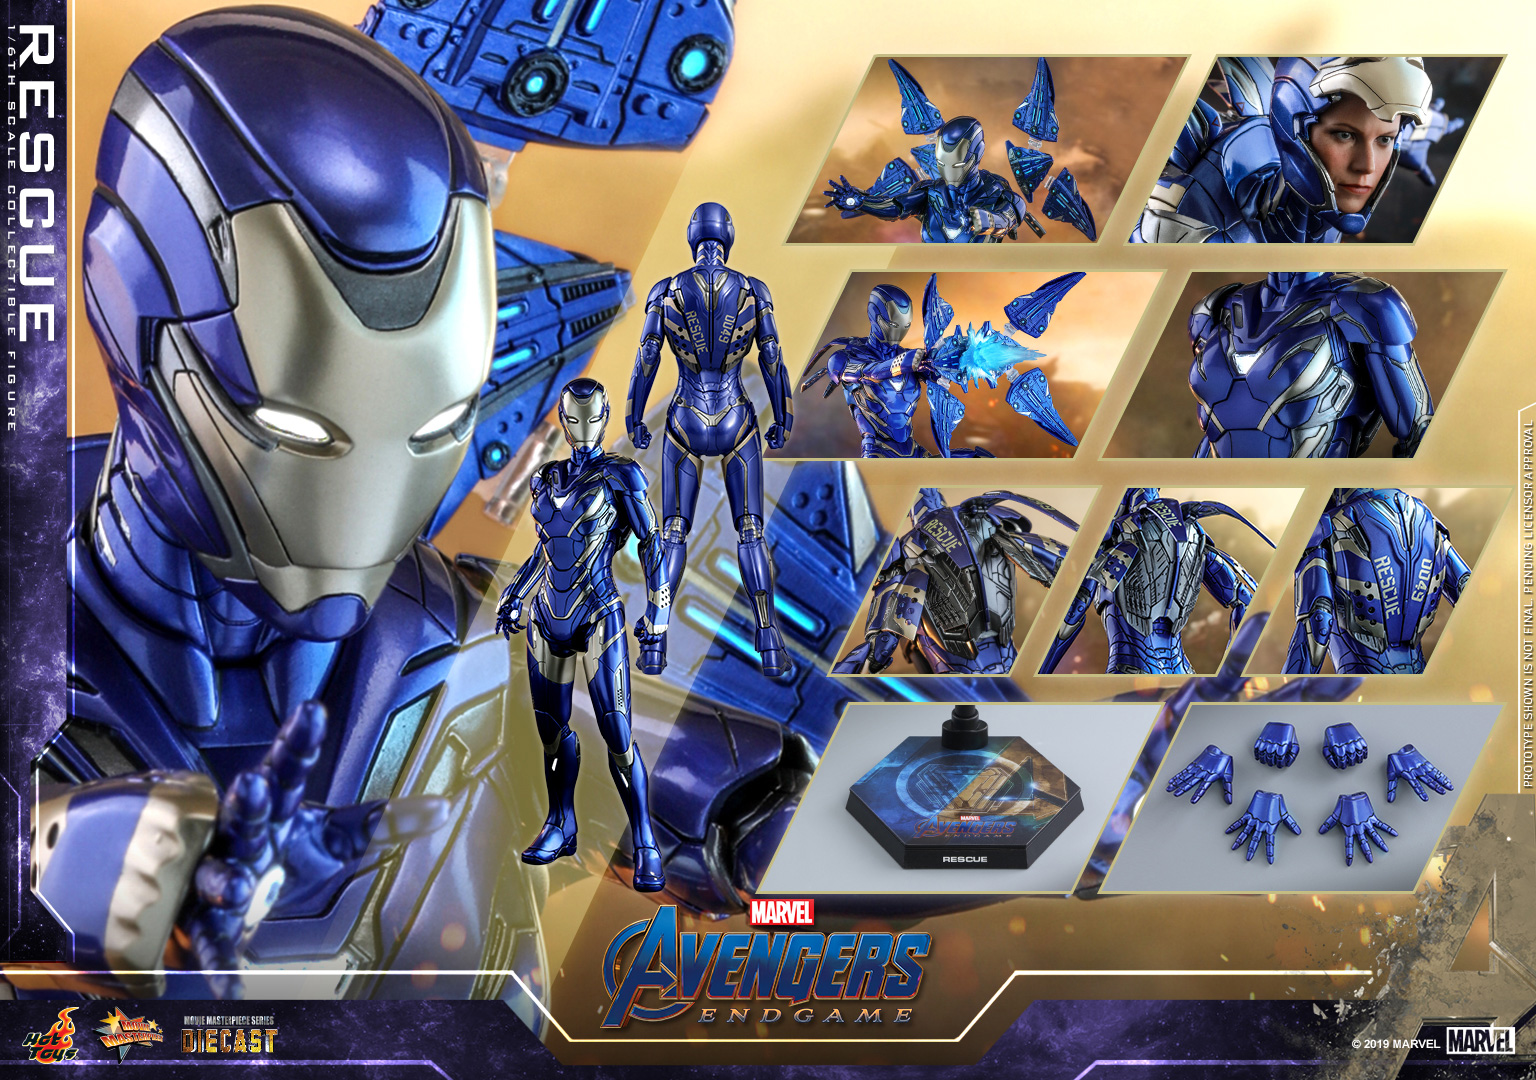 Hottoys ホットトイズ MMS538D32 アベンジャーズ エンドゲーム レスキュー 1 6スケールフィギュア 一般流通分 Avengers: Rescue Endgame 限定タイムセール - OUTLET SALE